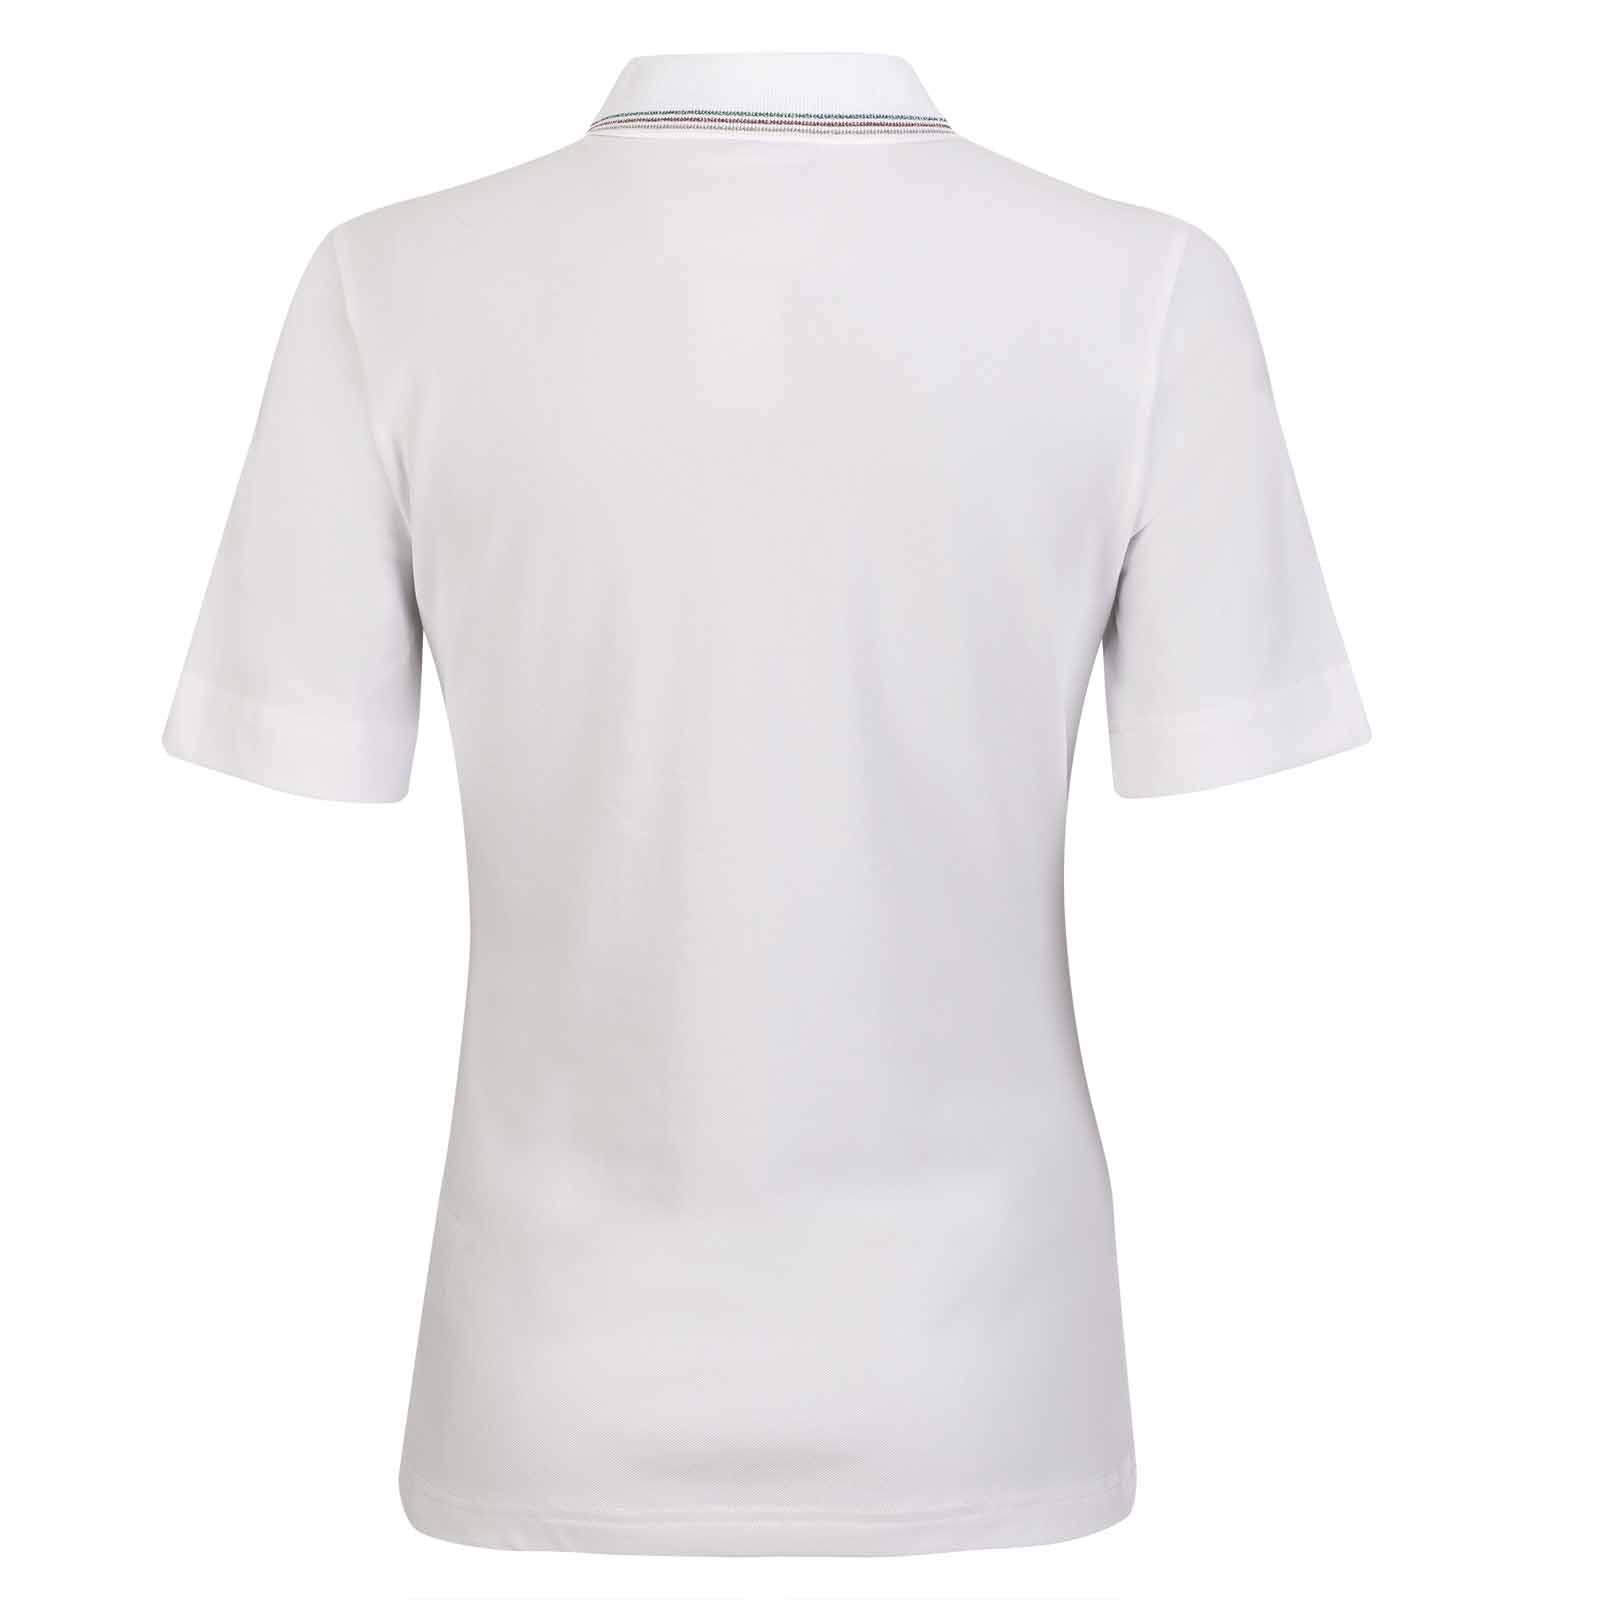 Damen Kurzarm Funktions-Golfpolo mit Sun Protection aus feiner Cotton-Blend